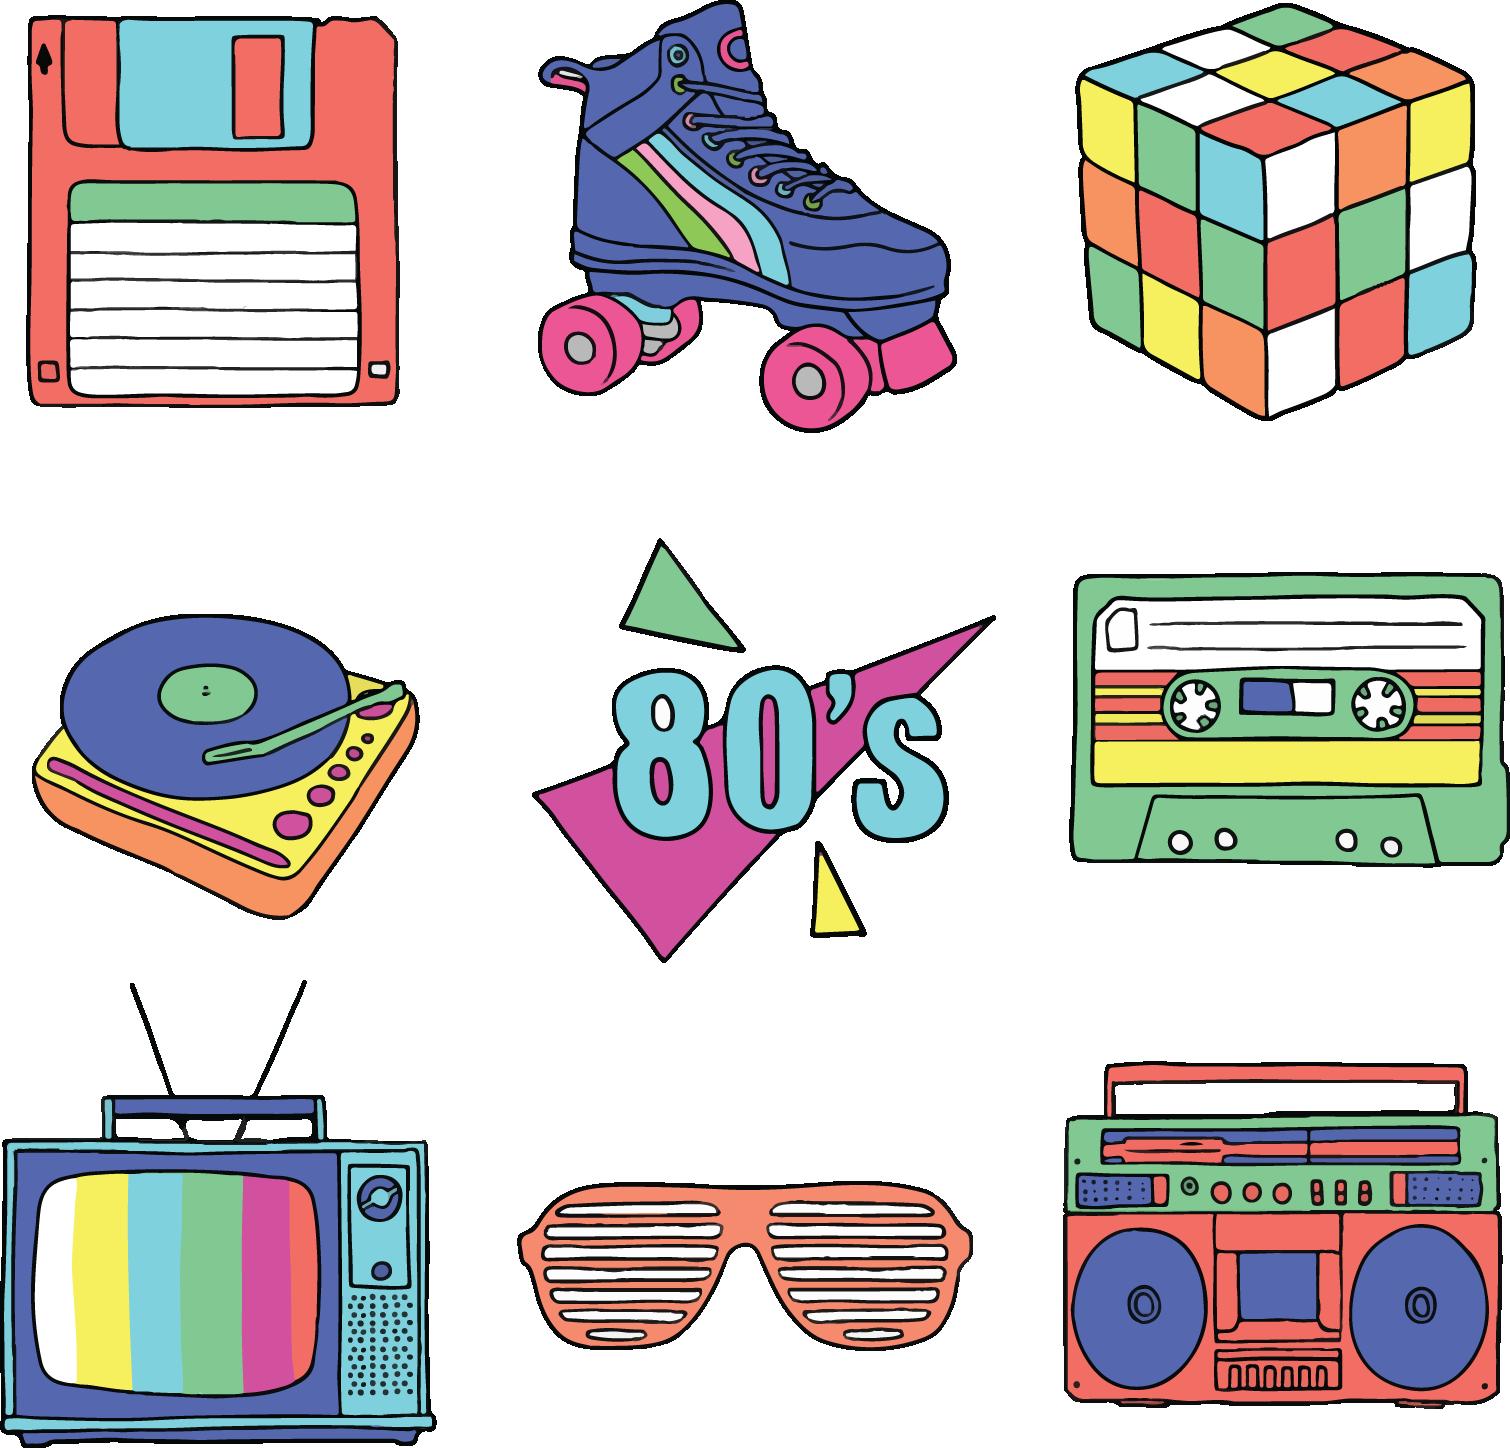 Adobe illustrator clip art. 80's clipart transparent